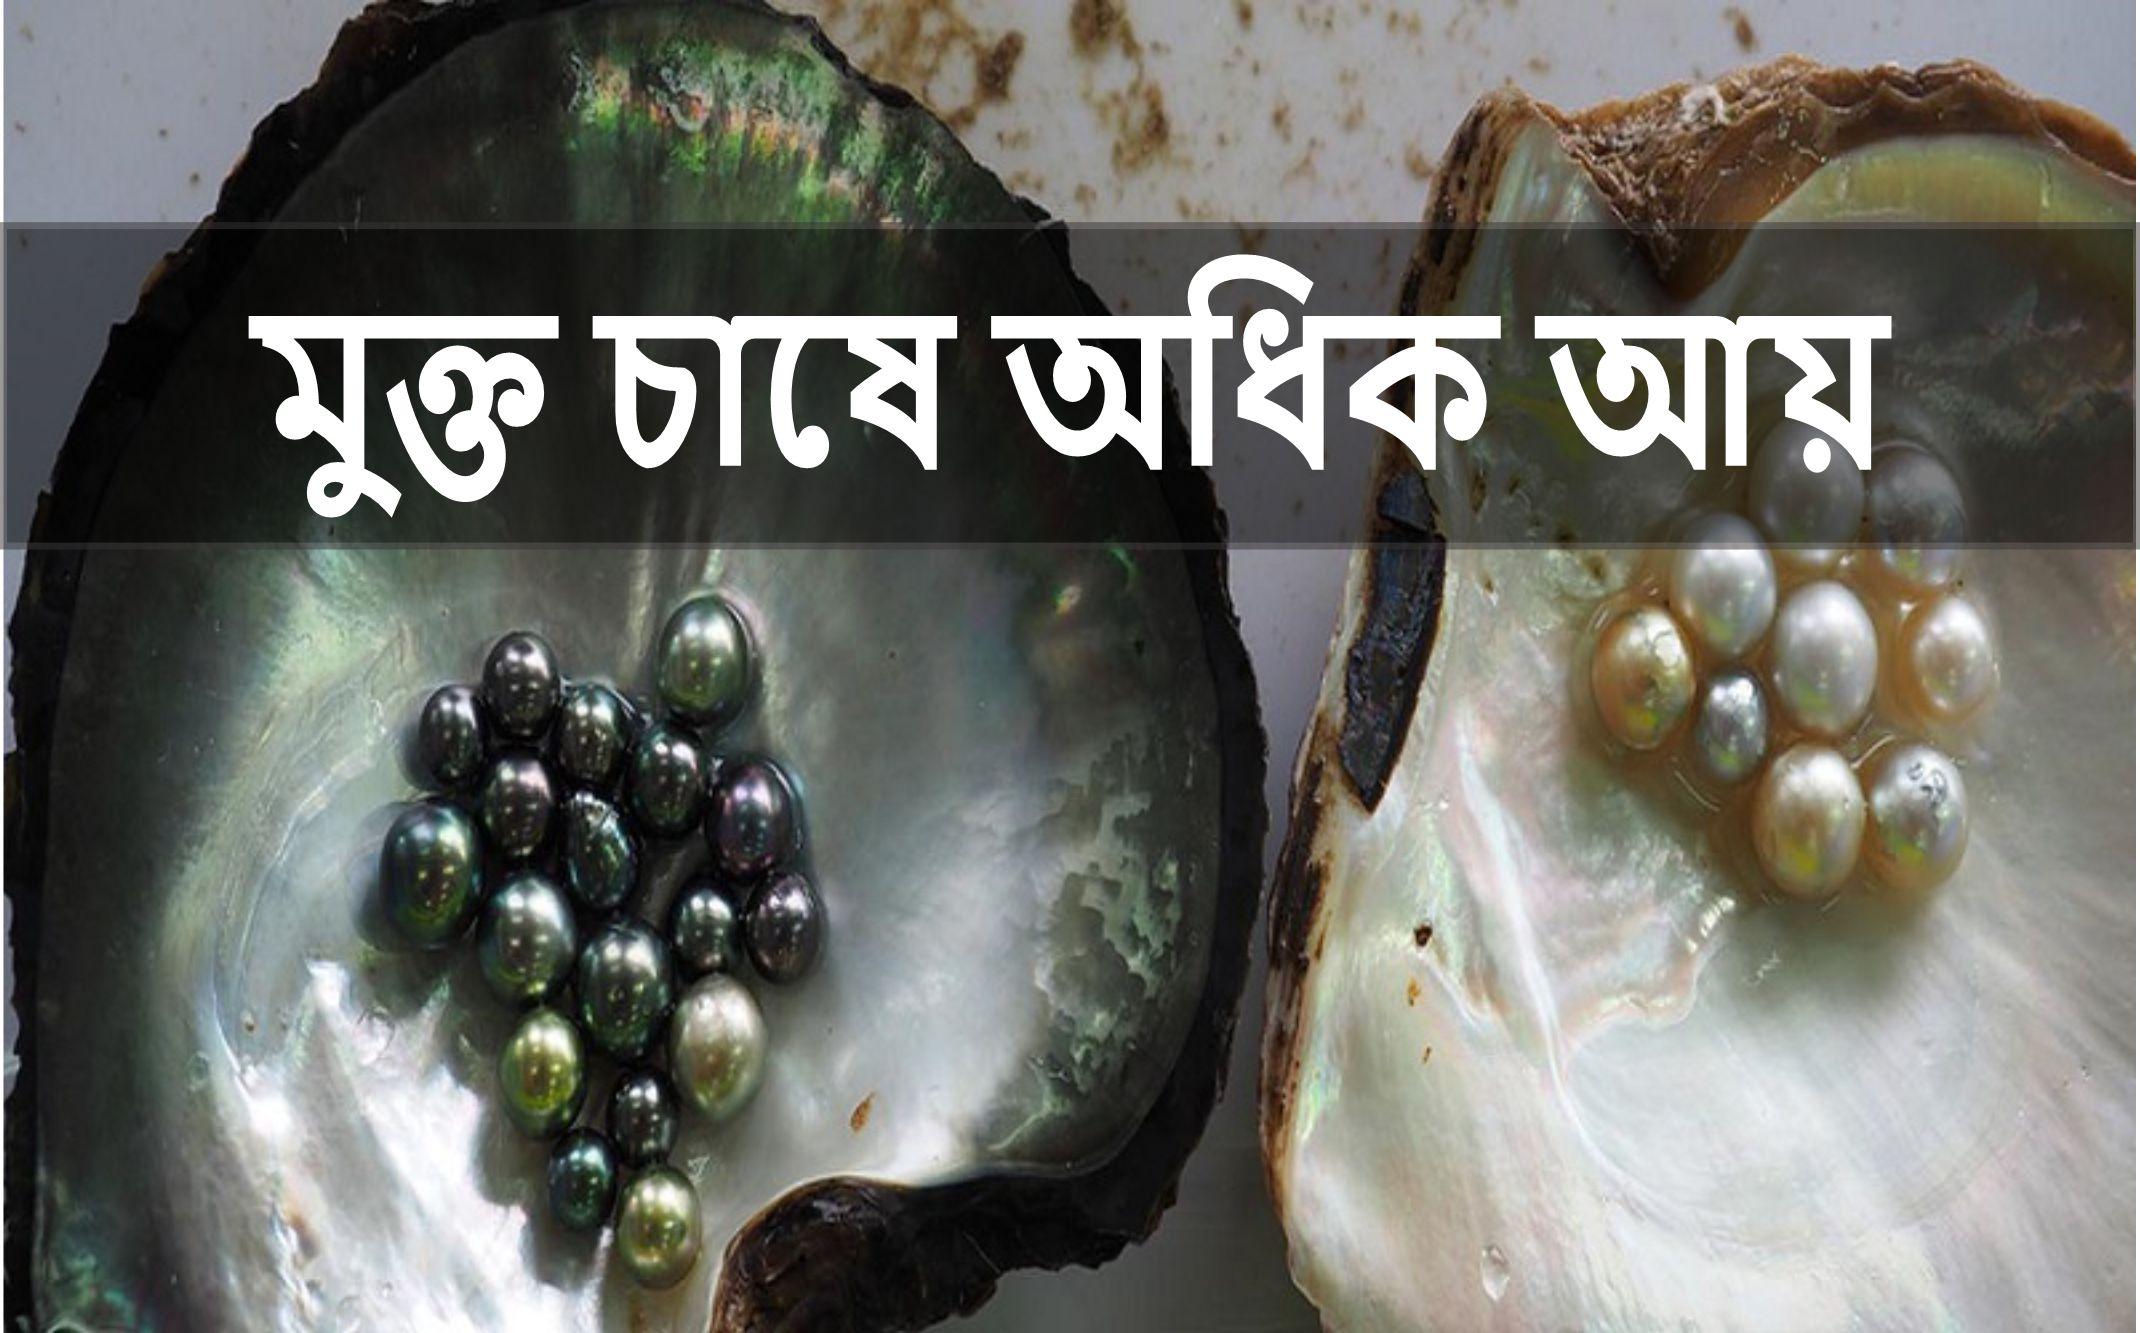 Pearl Farming Guidance: জেনে নিন মুক্ত চাষের সম্পূর্ণ পদ্ধতি